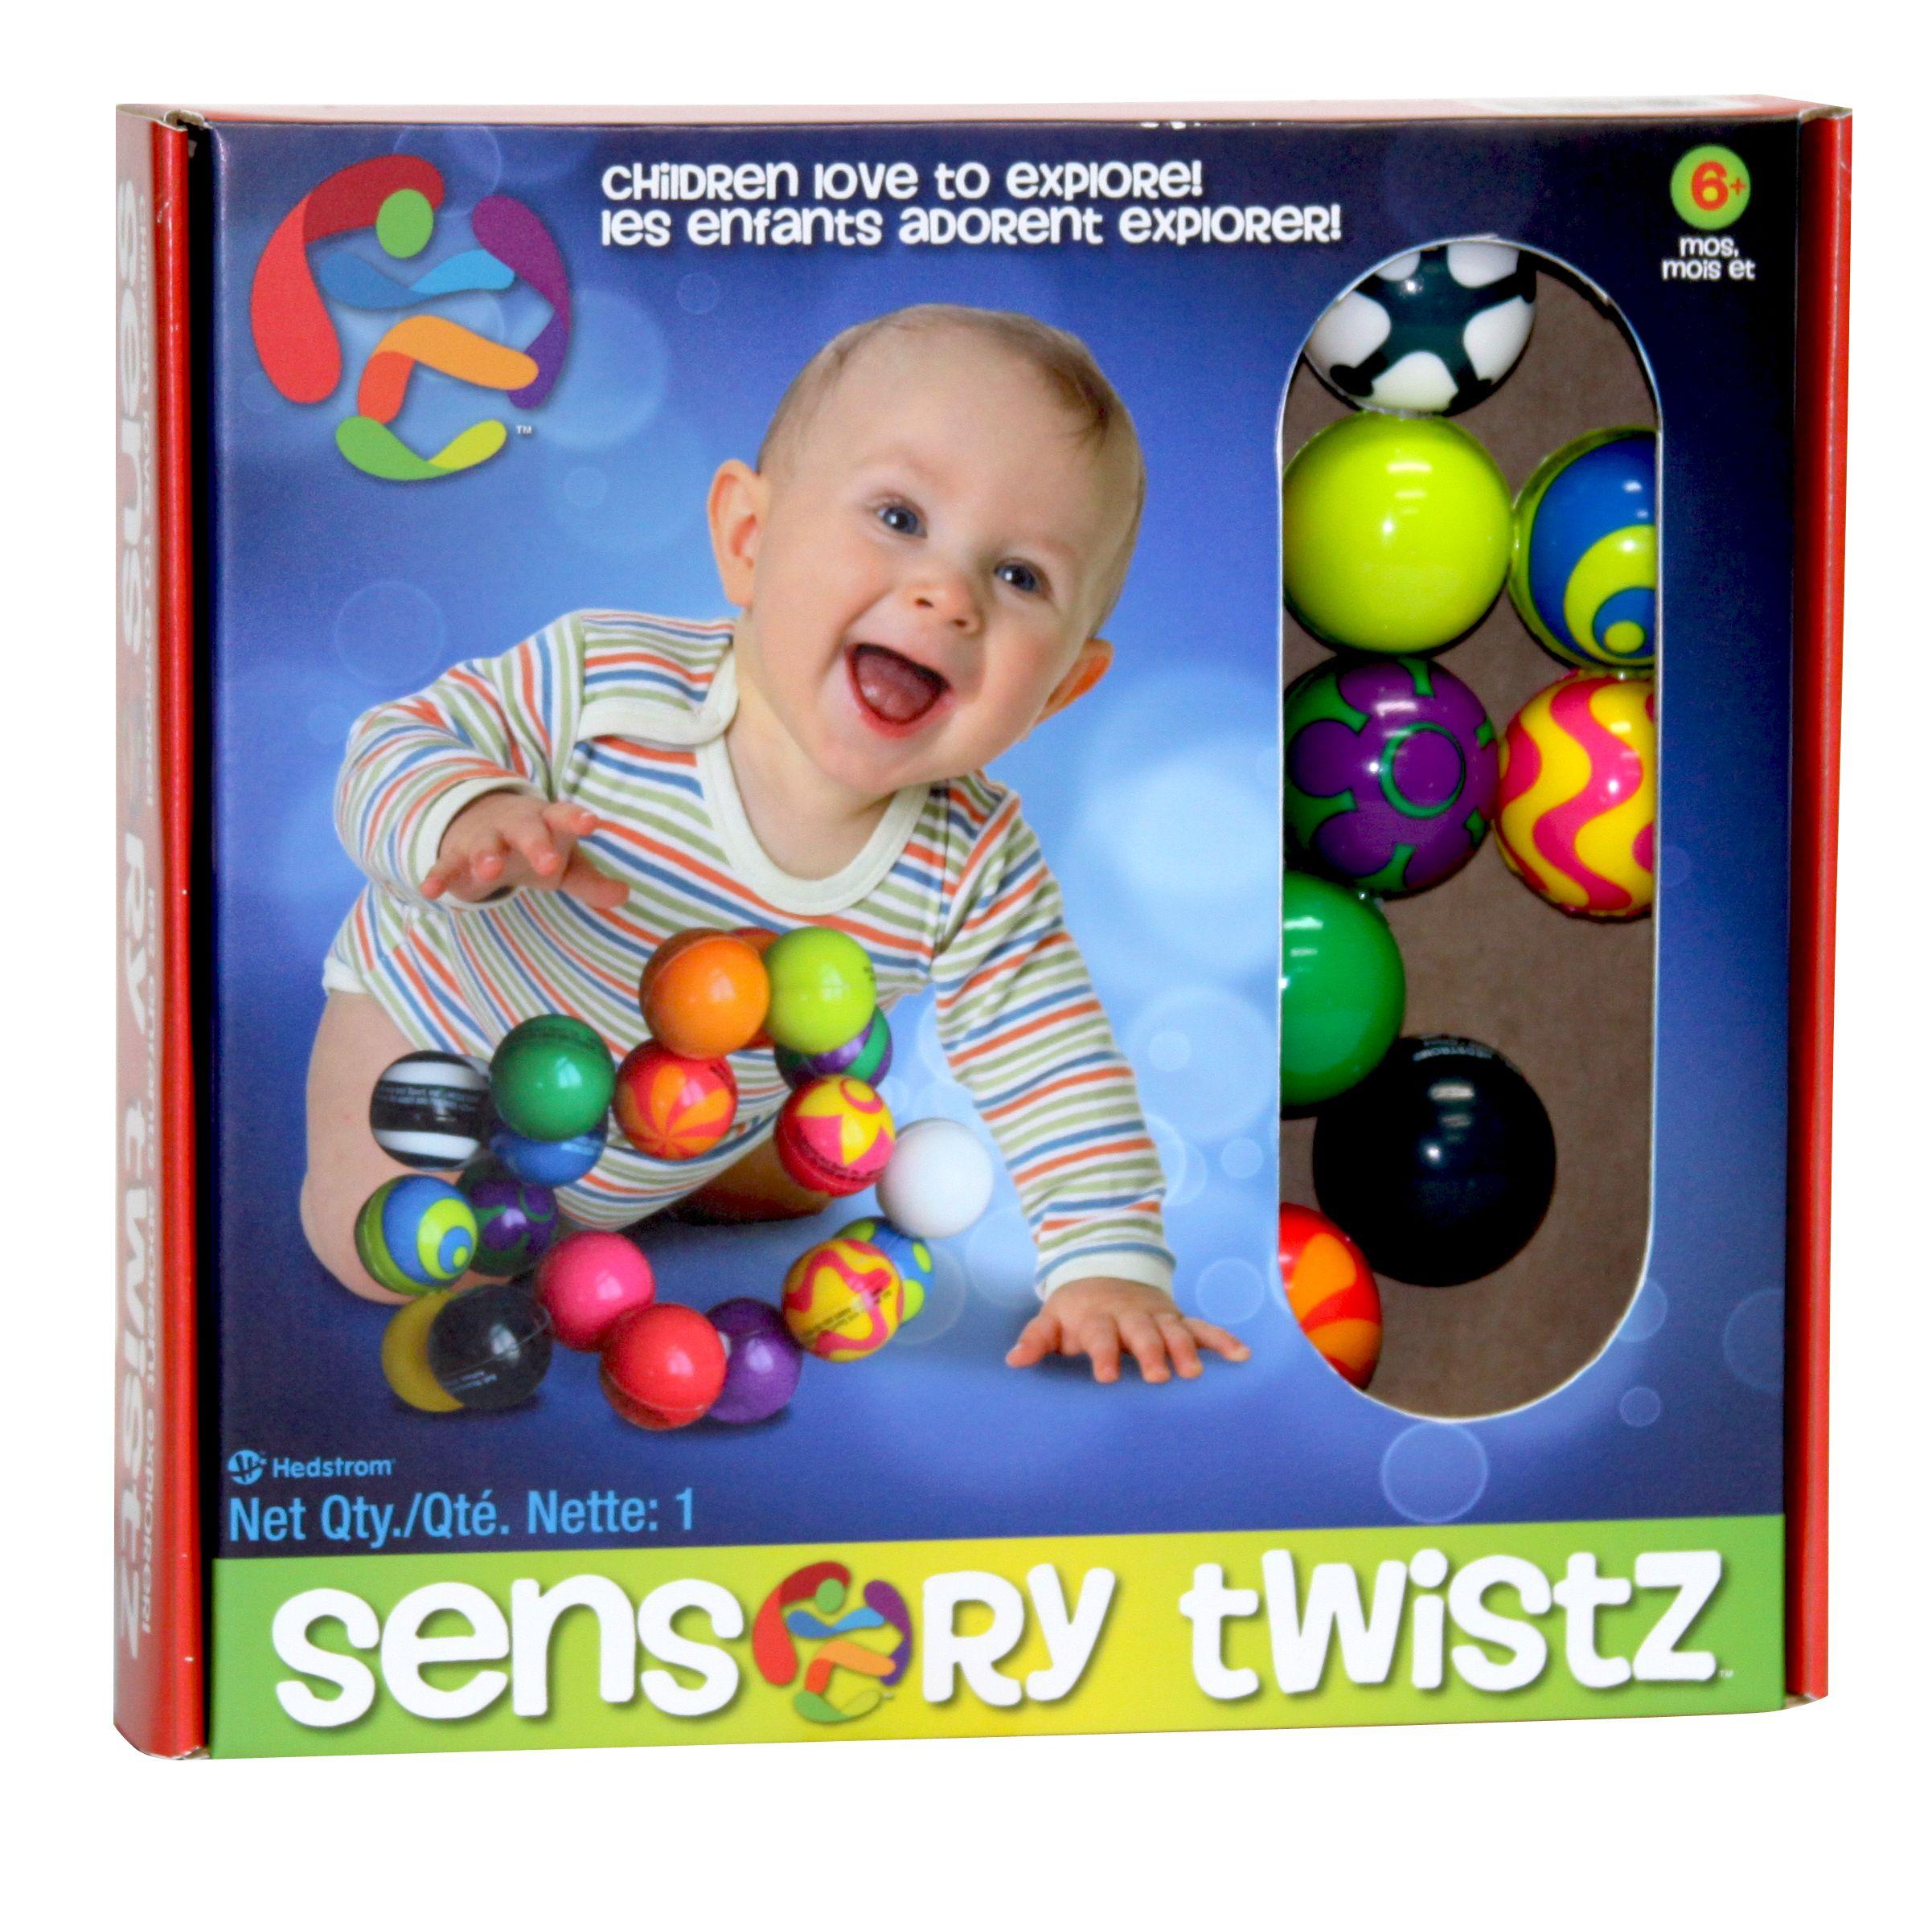 Twist twirl and squish Hedstrom s Sensory Twistz Create fun